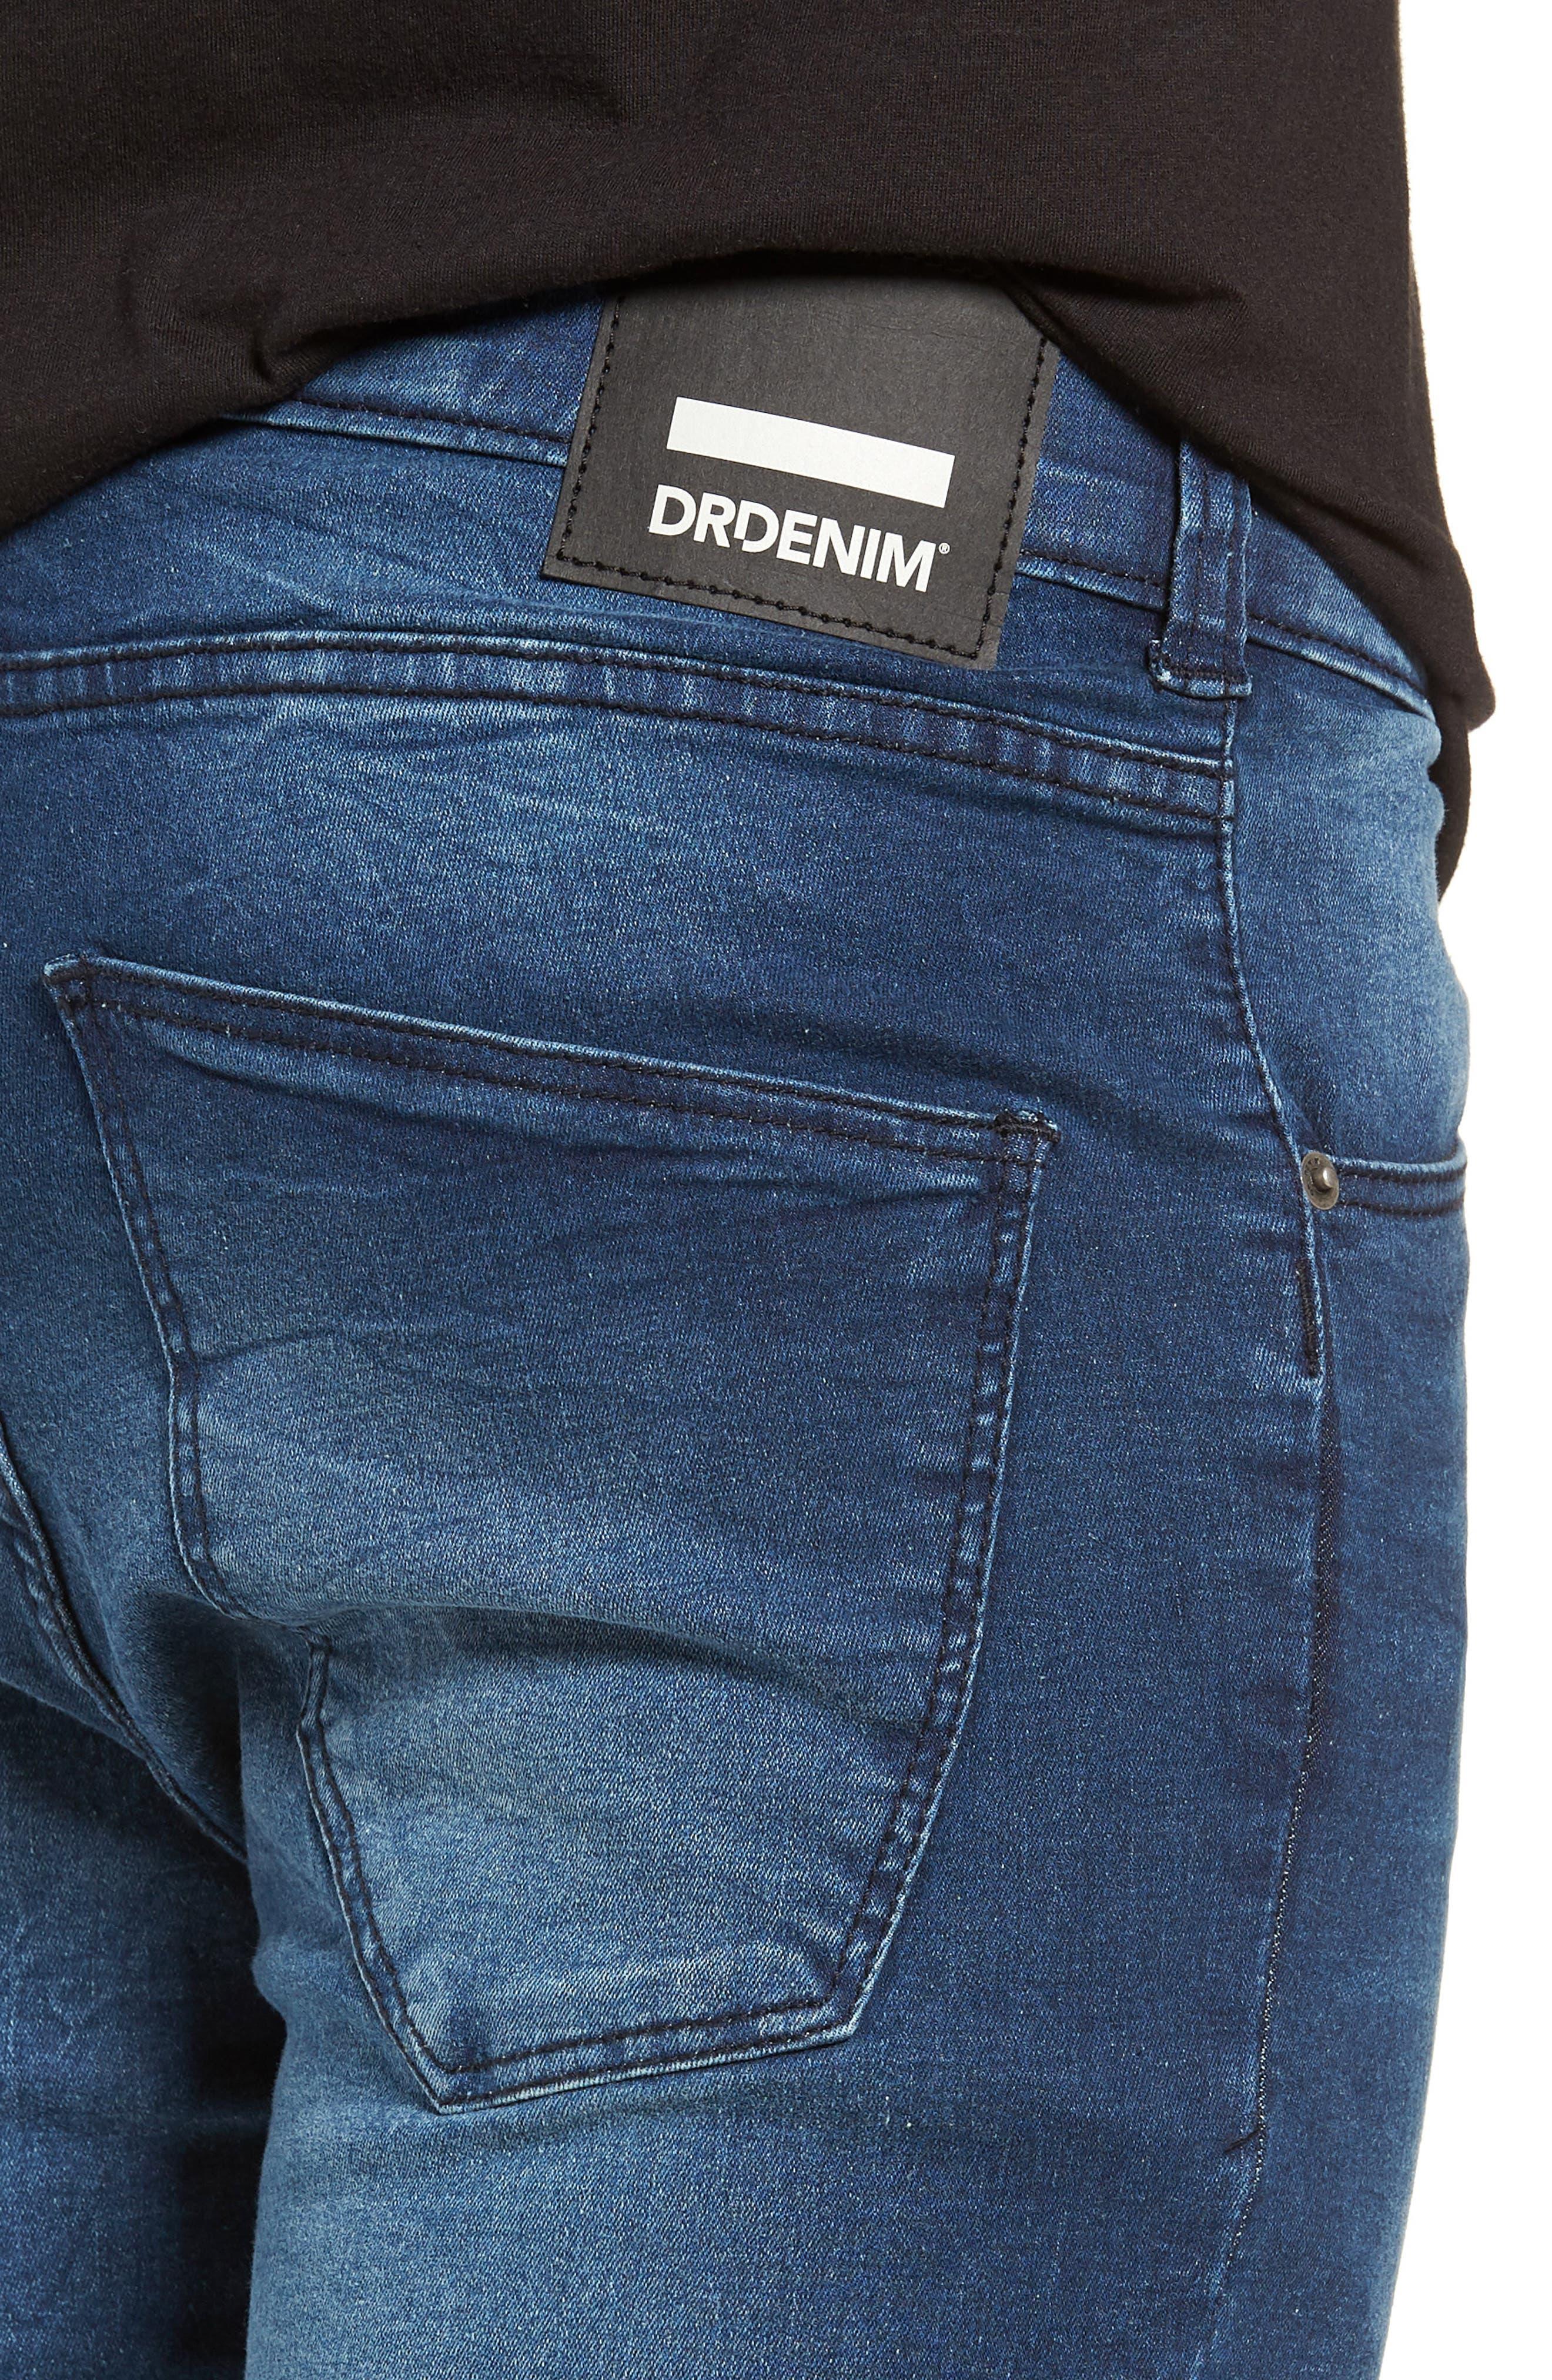 Leroy Skinny Fit Jeans,                             Alternate thumbnail 4, color,                             WORN DARK BLUE